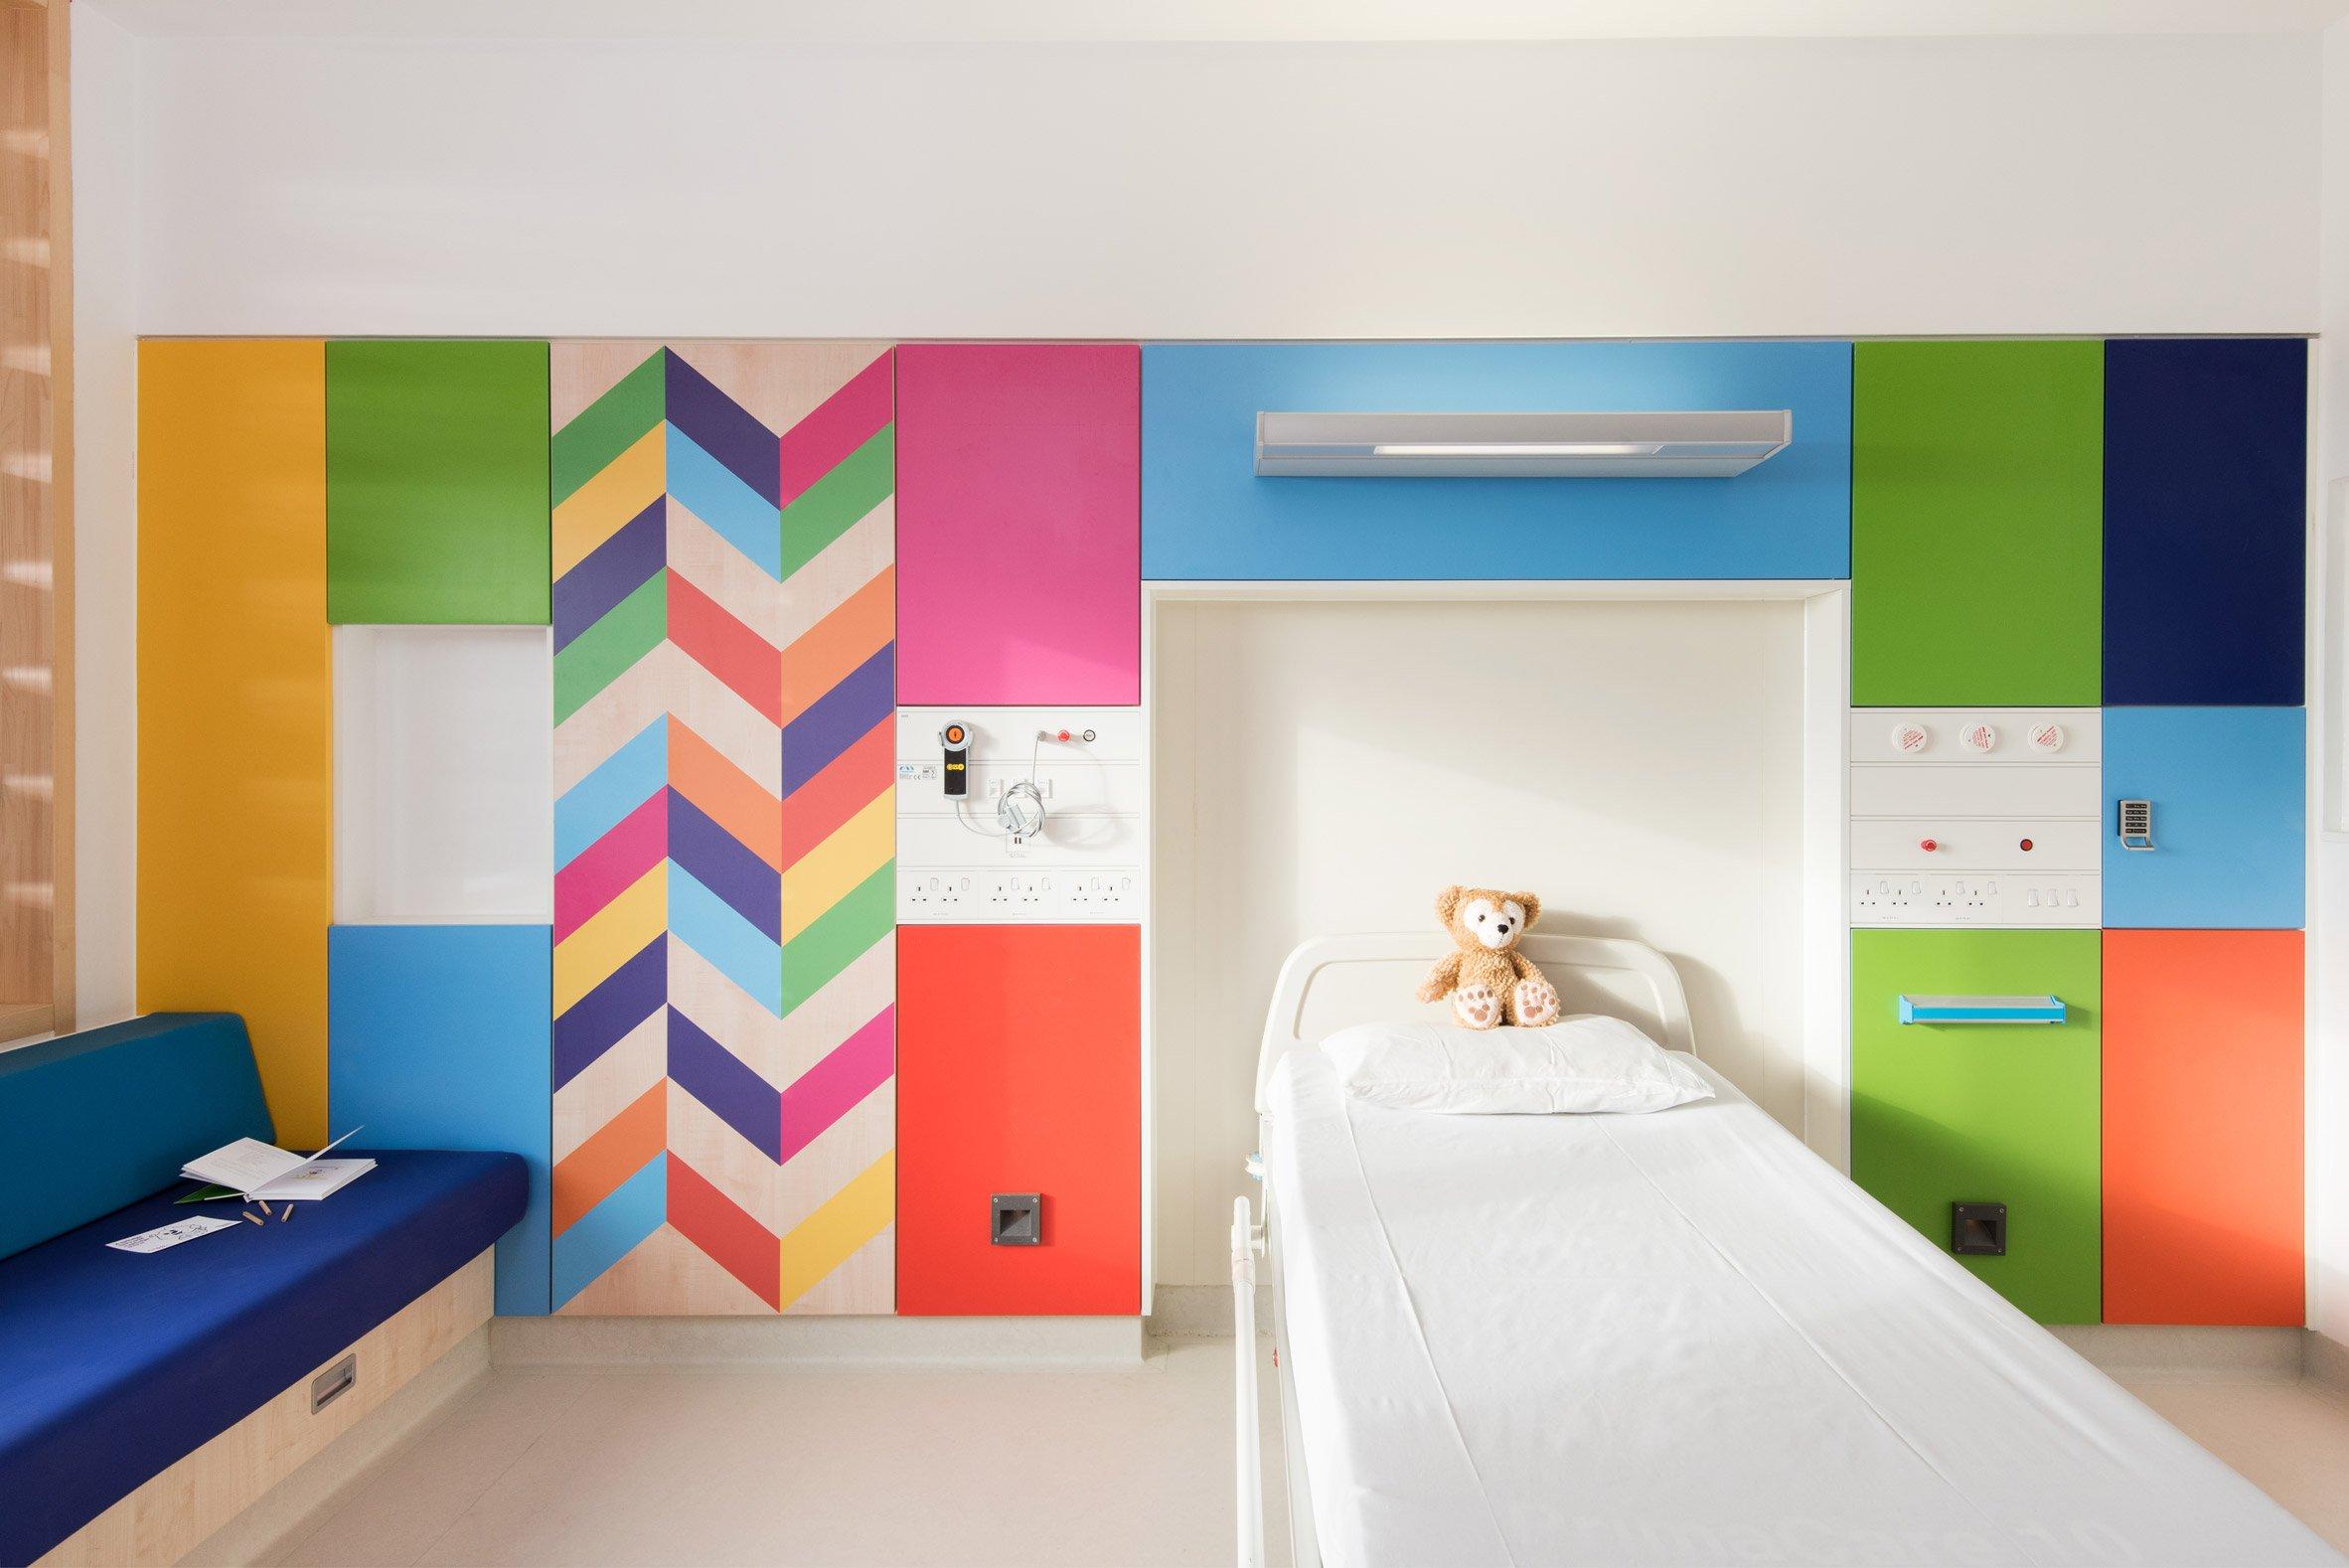 Sheffield Hospital design